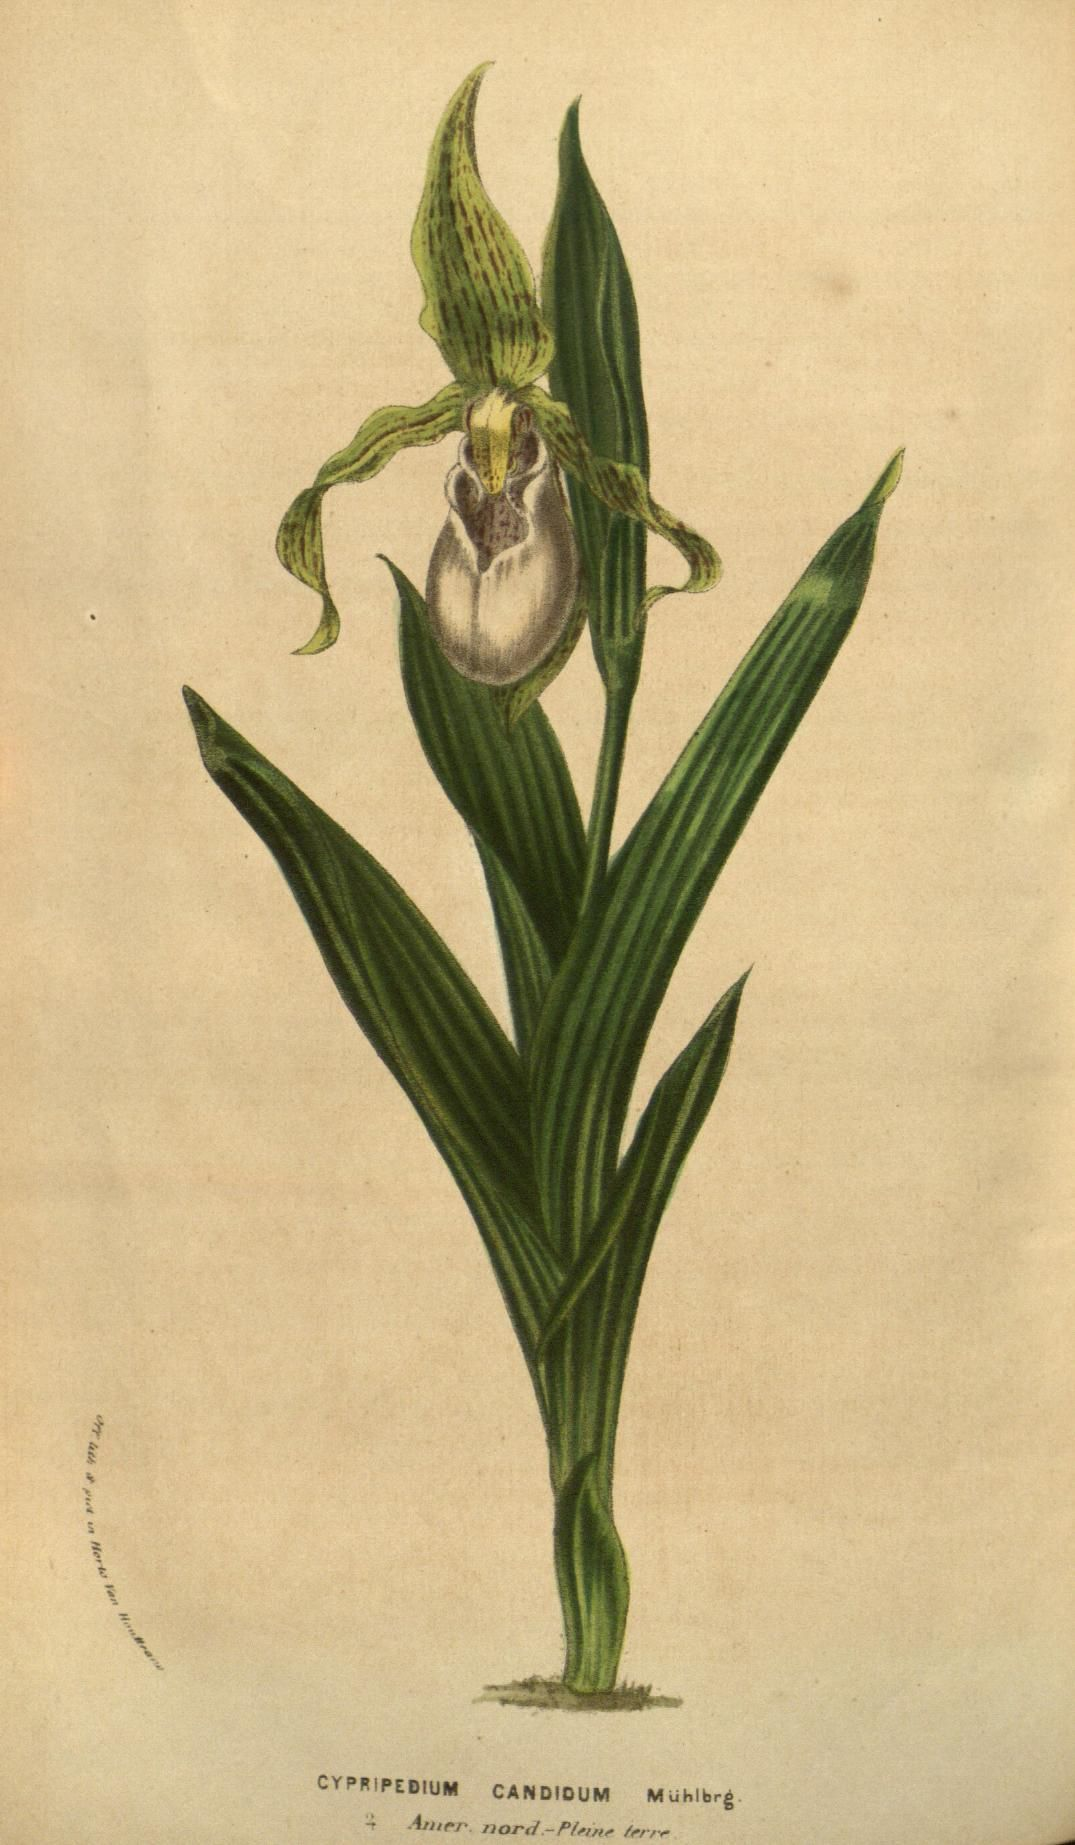 Cypripedium candidum